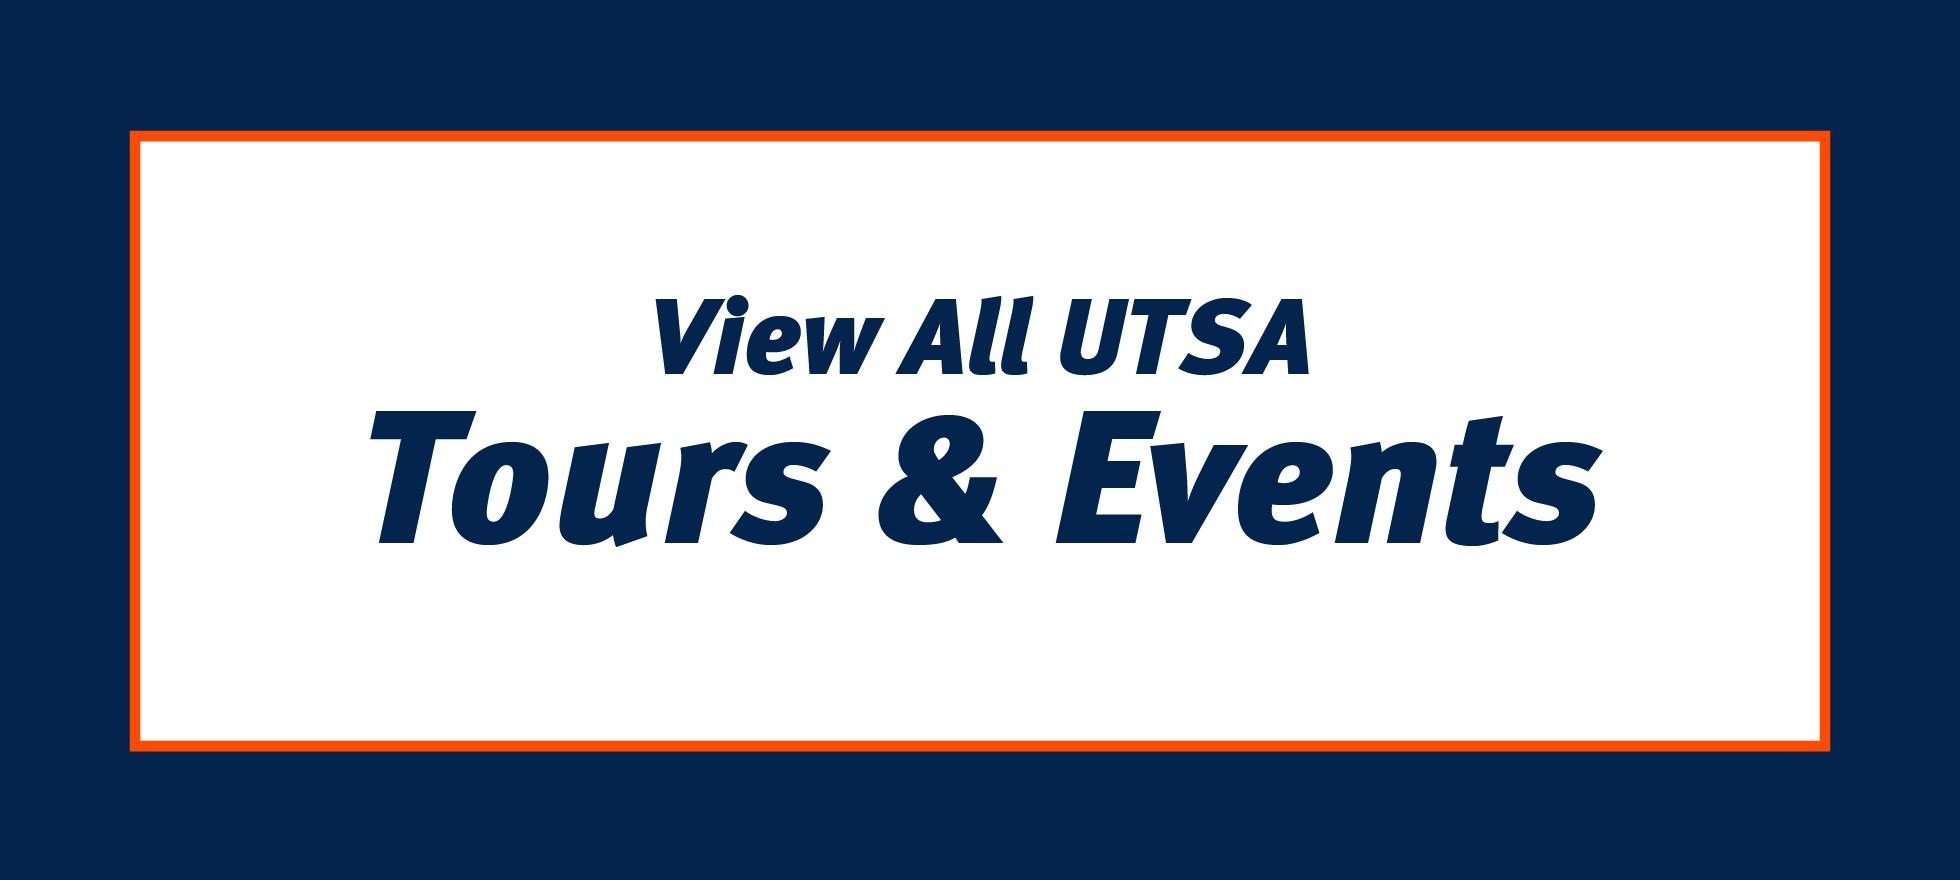 View All UTSA Tours & Events